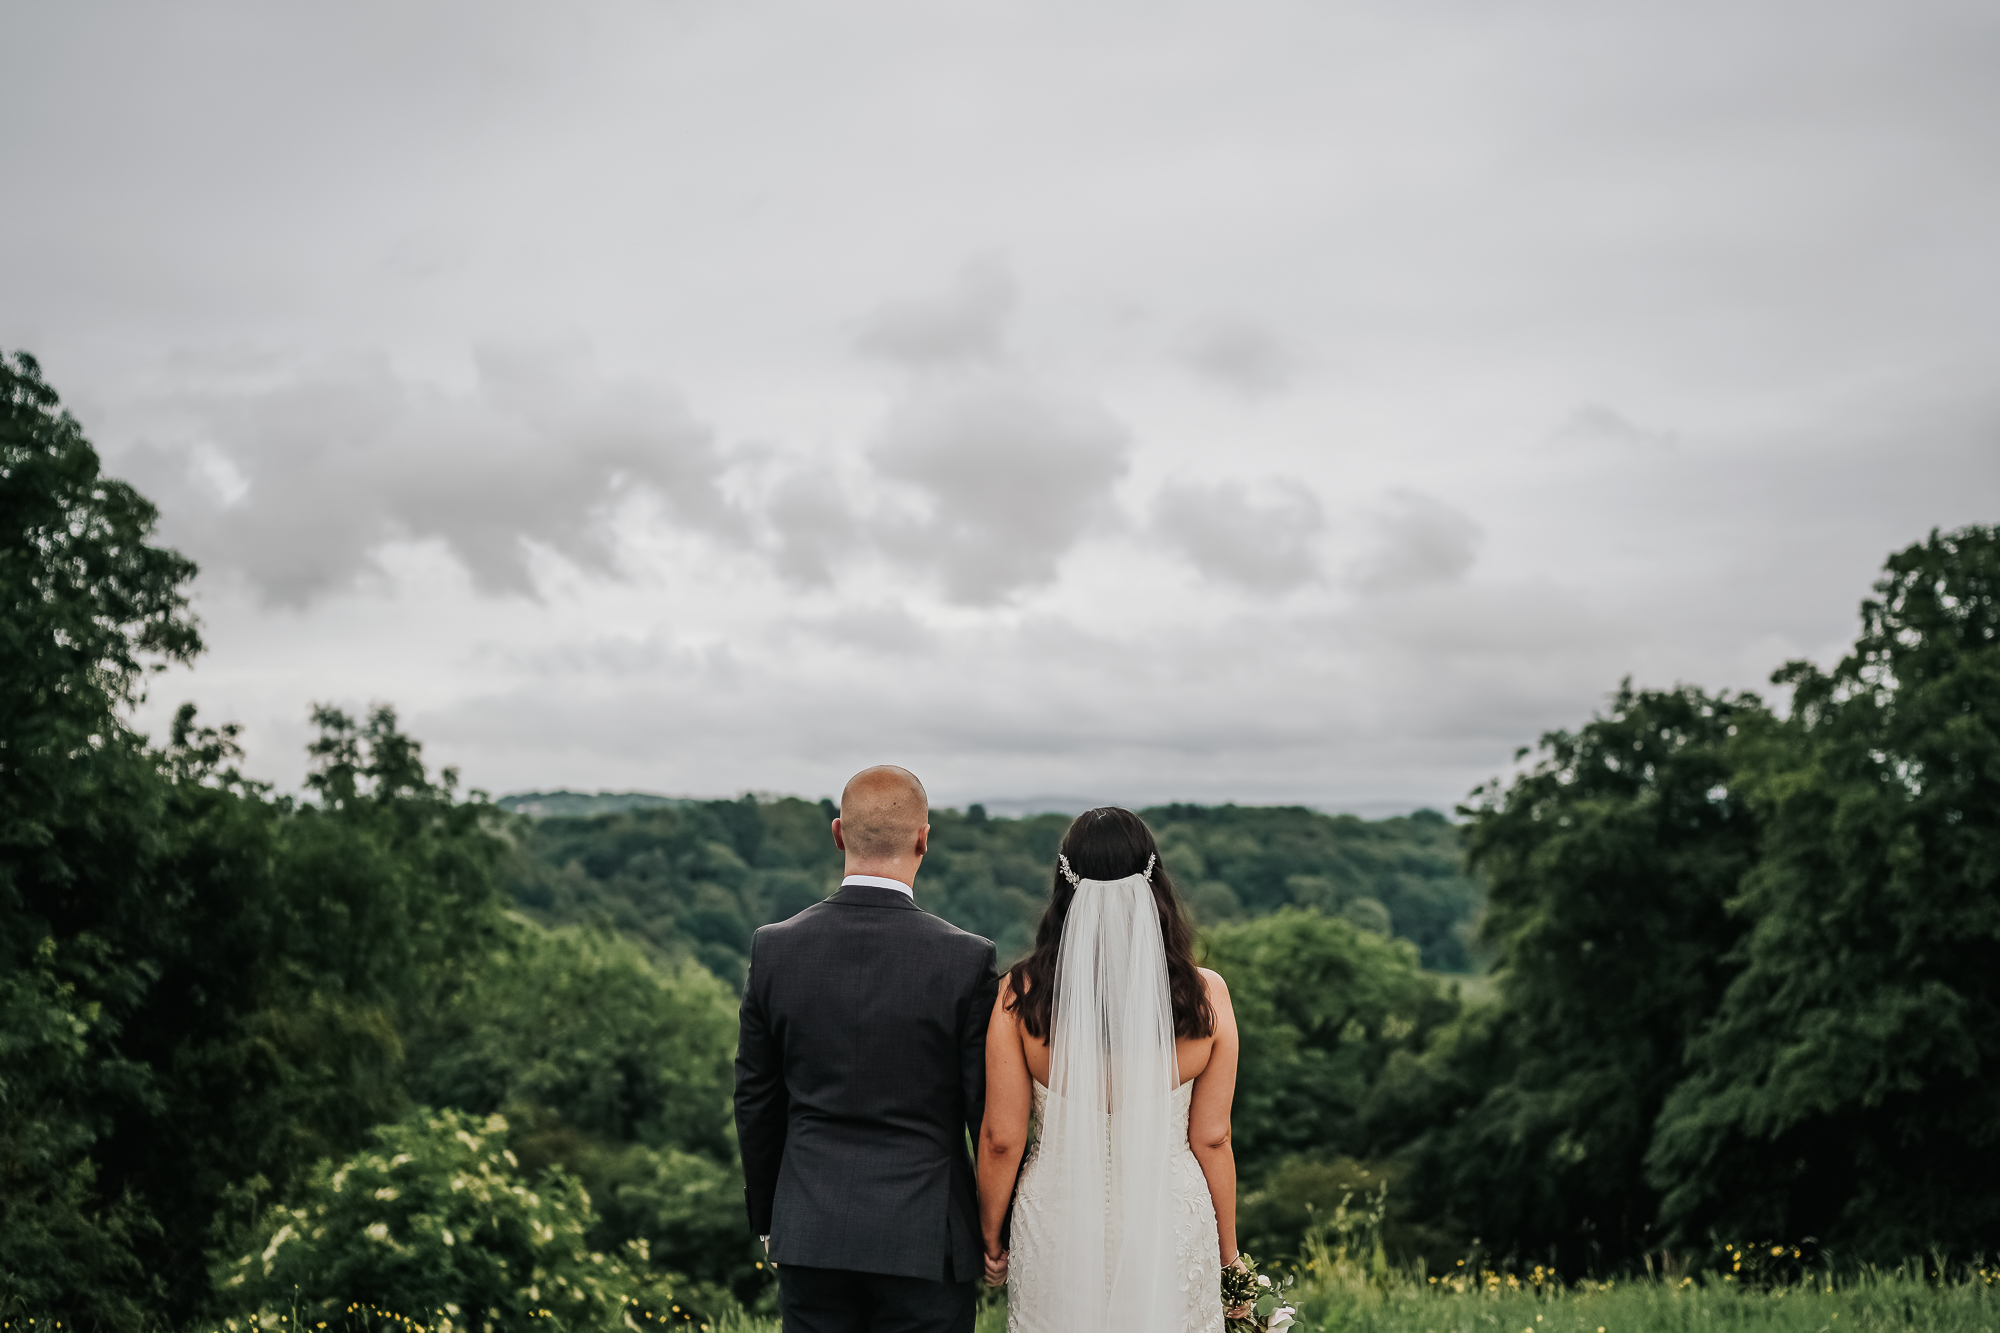 Hyde Bank Farm Wedding Photography Manchester wedding photographer (42 of 49).jpg